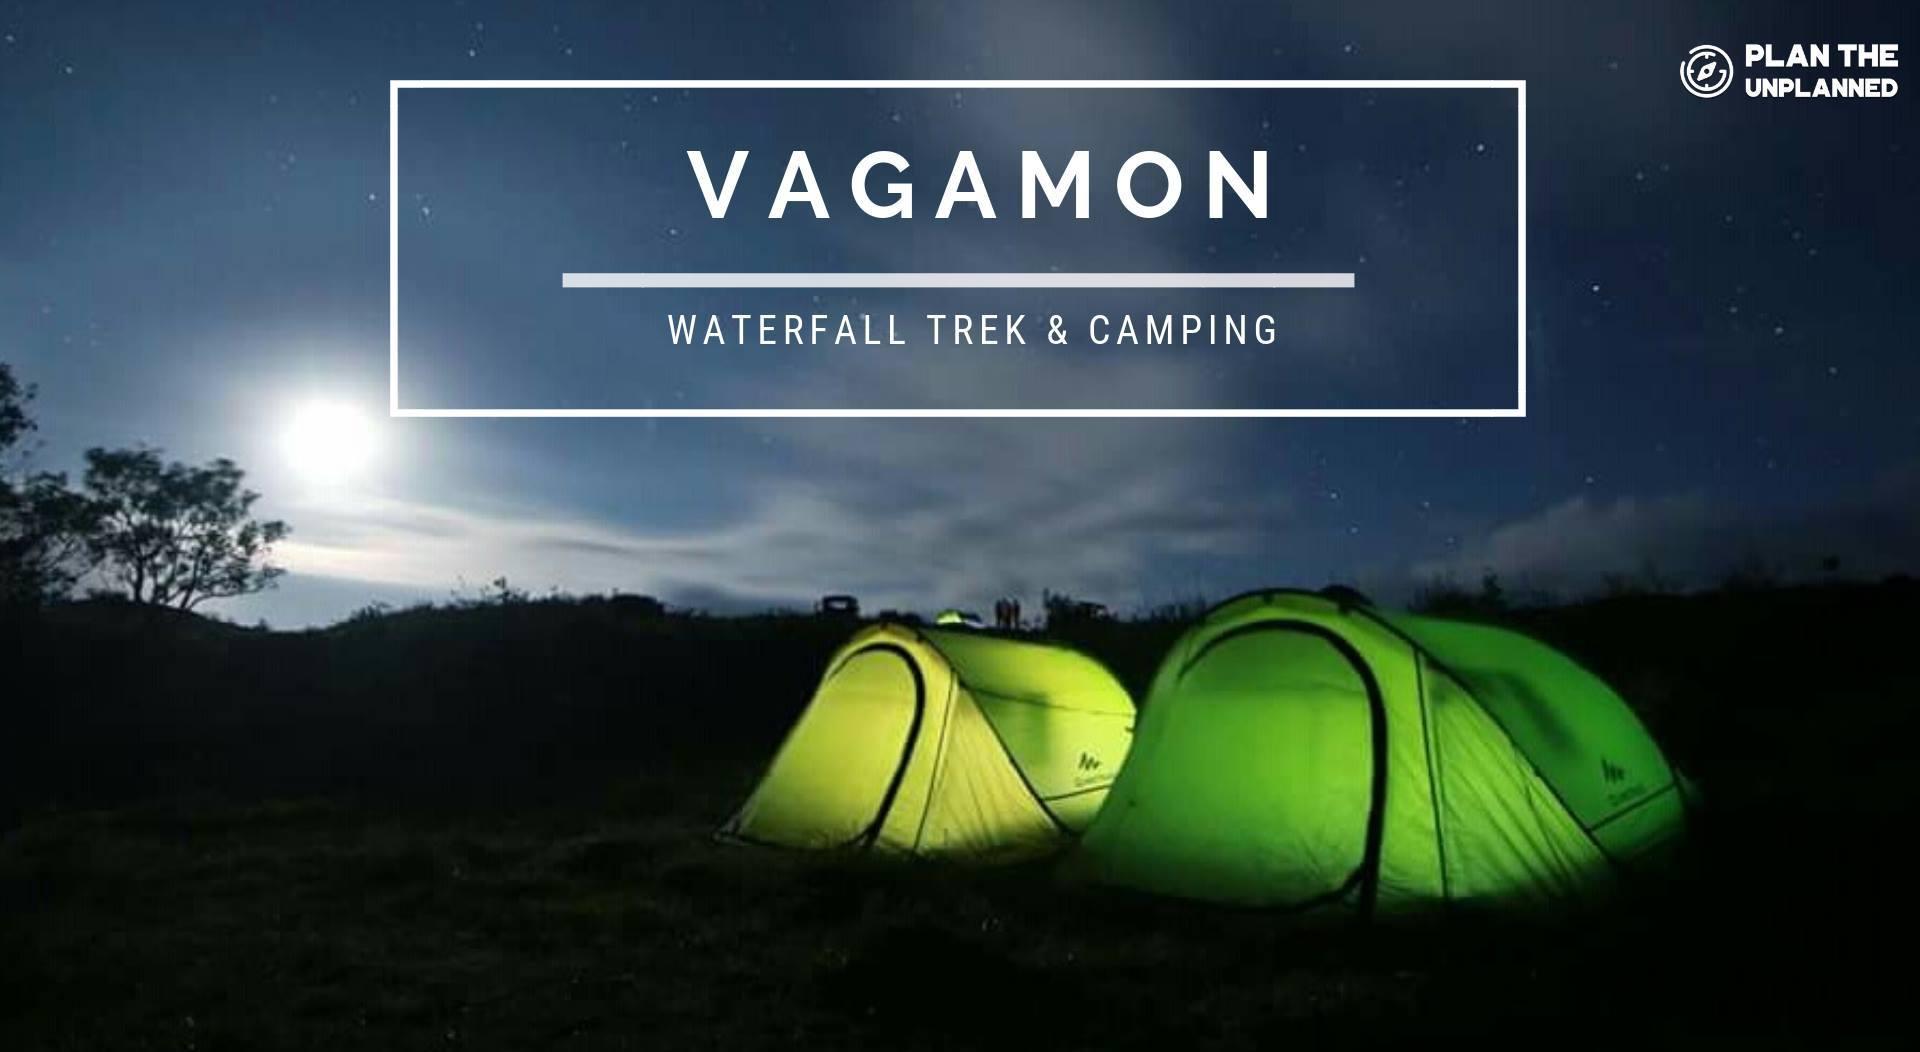 background-image-vagamon-waterfall-trek-camping-times-prime